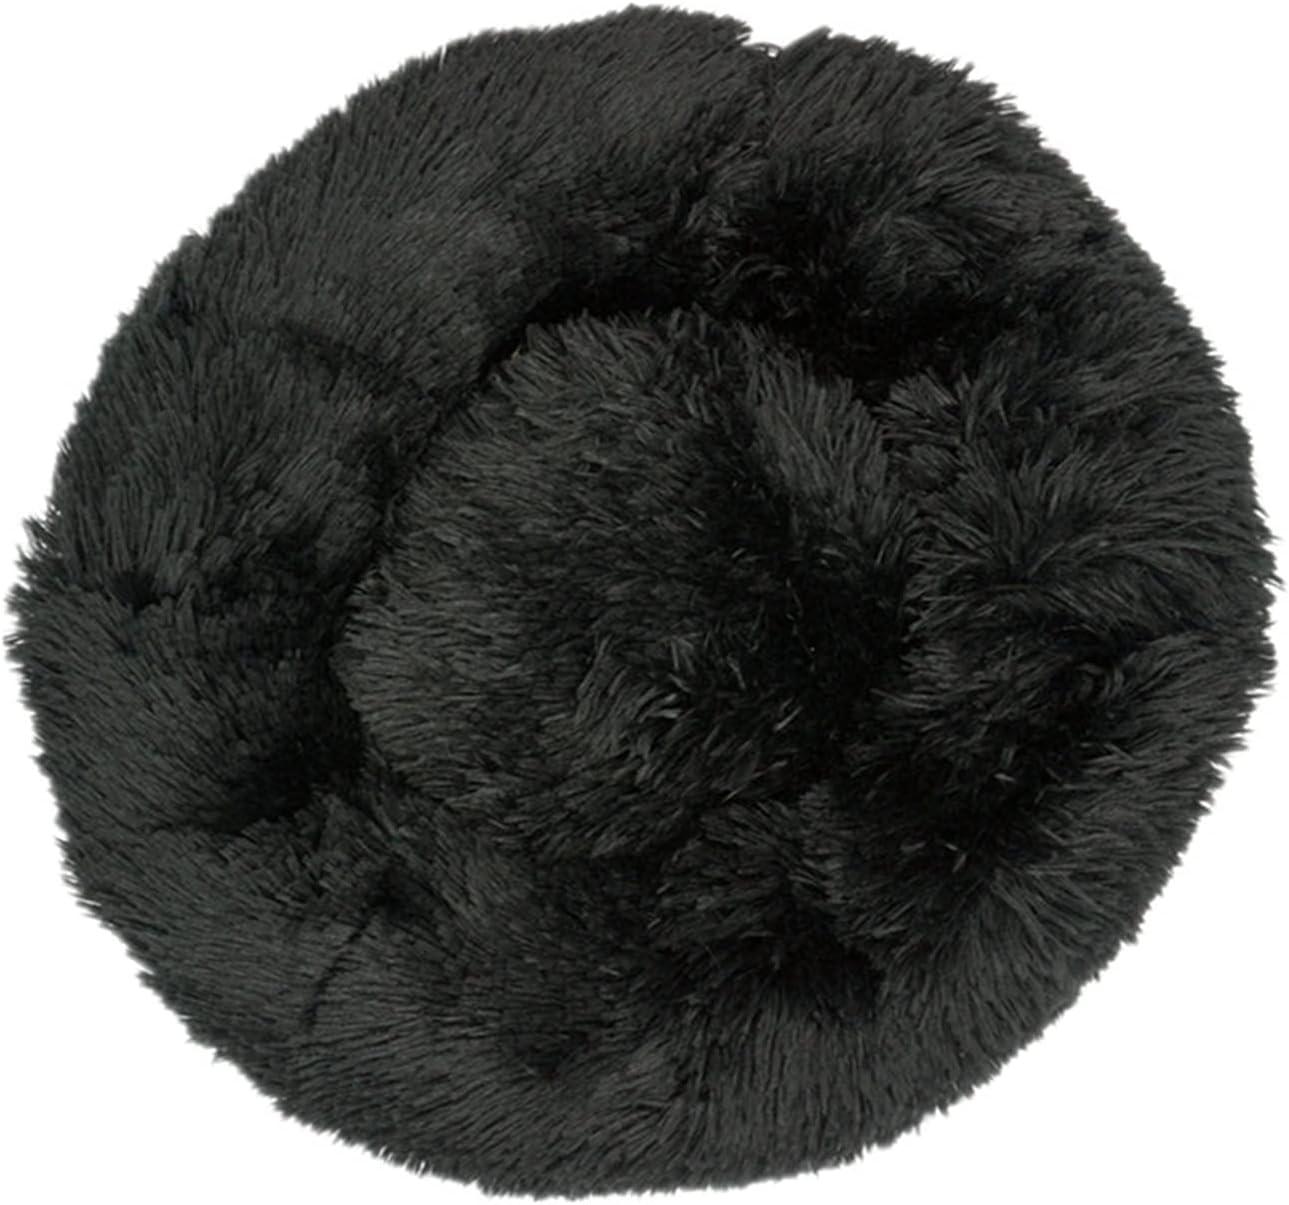 LWXFXBH Soft Max 87% OFF Dog shop Bed Sofa Plush Mat Large Labrador Cat D